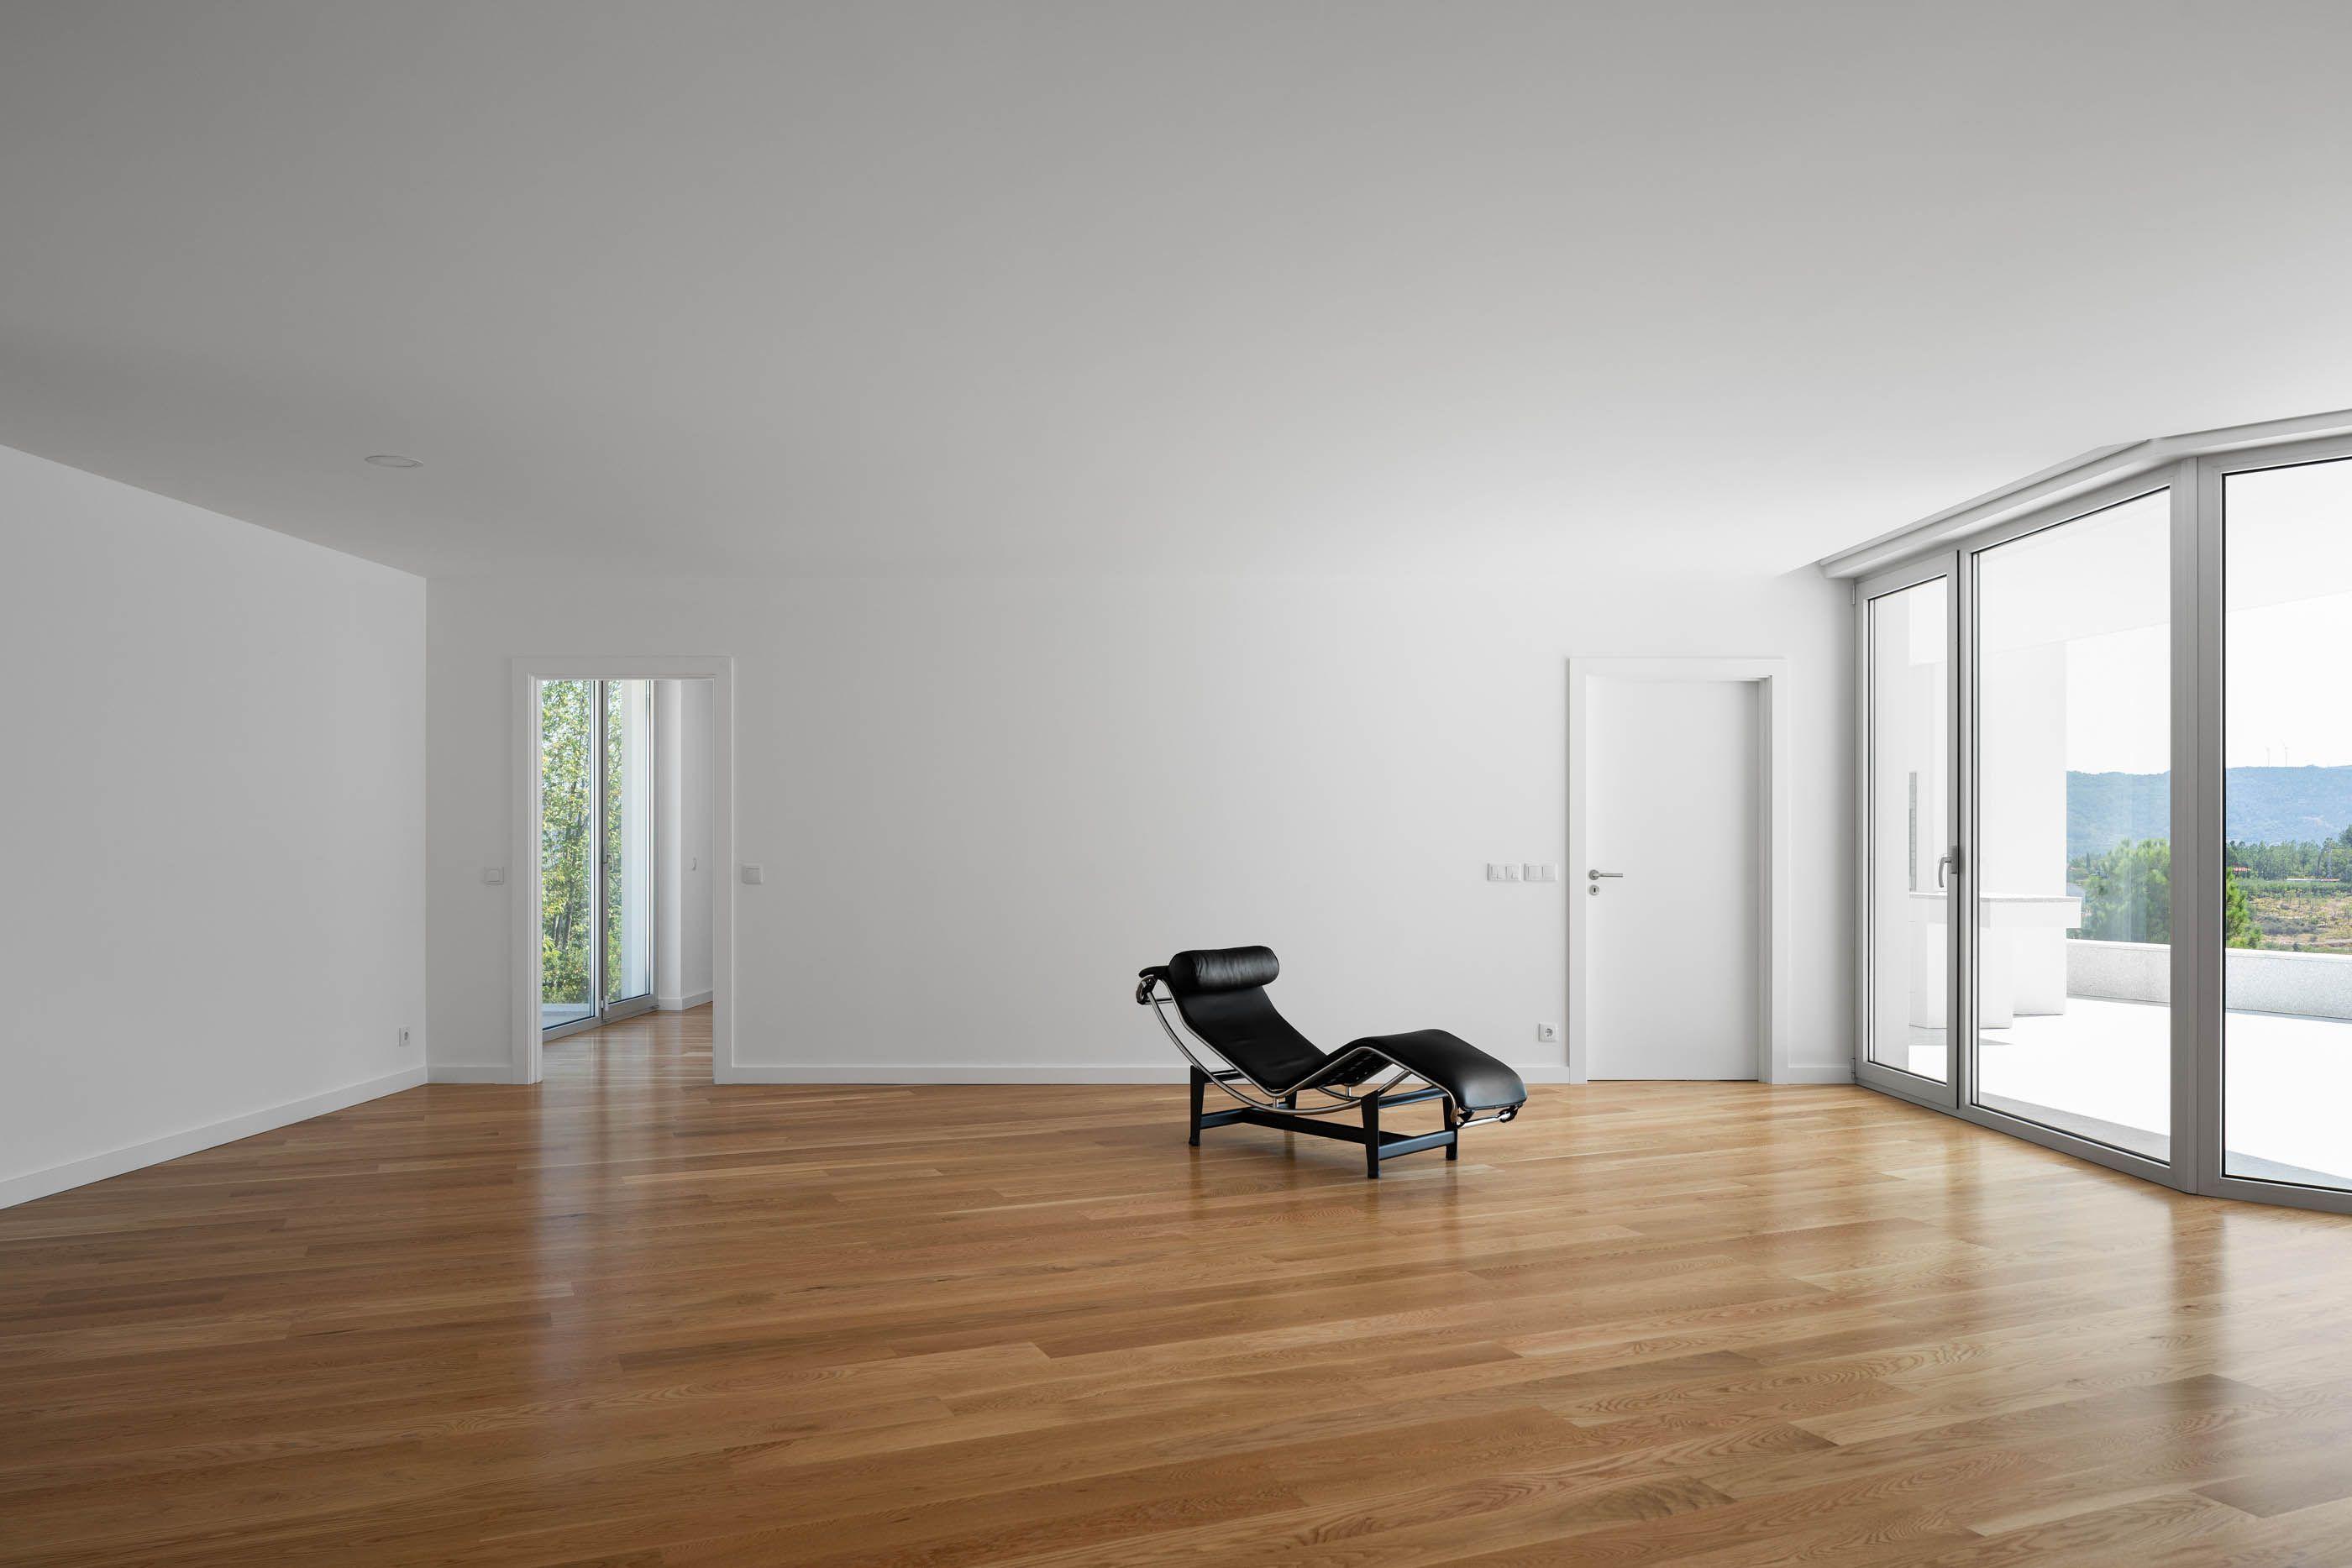 Interior Design Firm Kitchen Interior Design Best Schools For Interior Design Free Software For Interior Design Programming In 2020 Architect Floor Skirting House